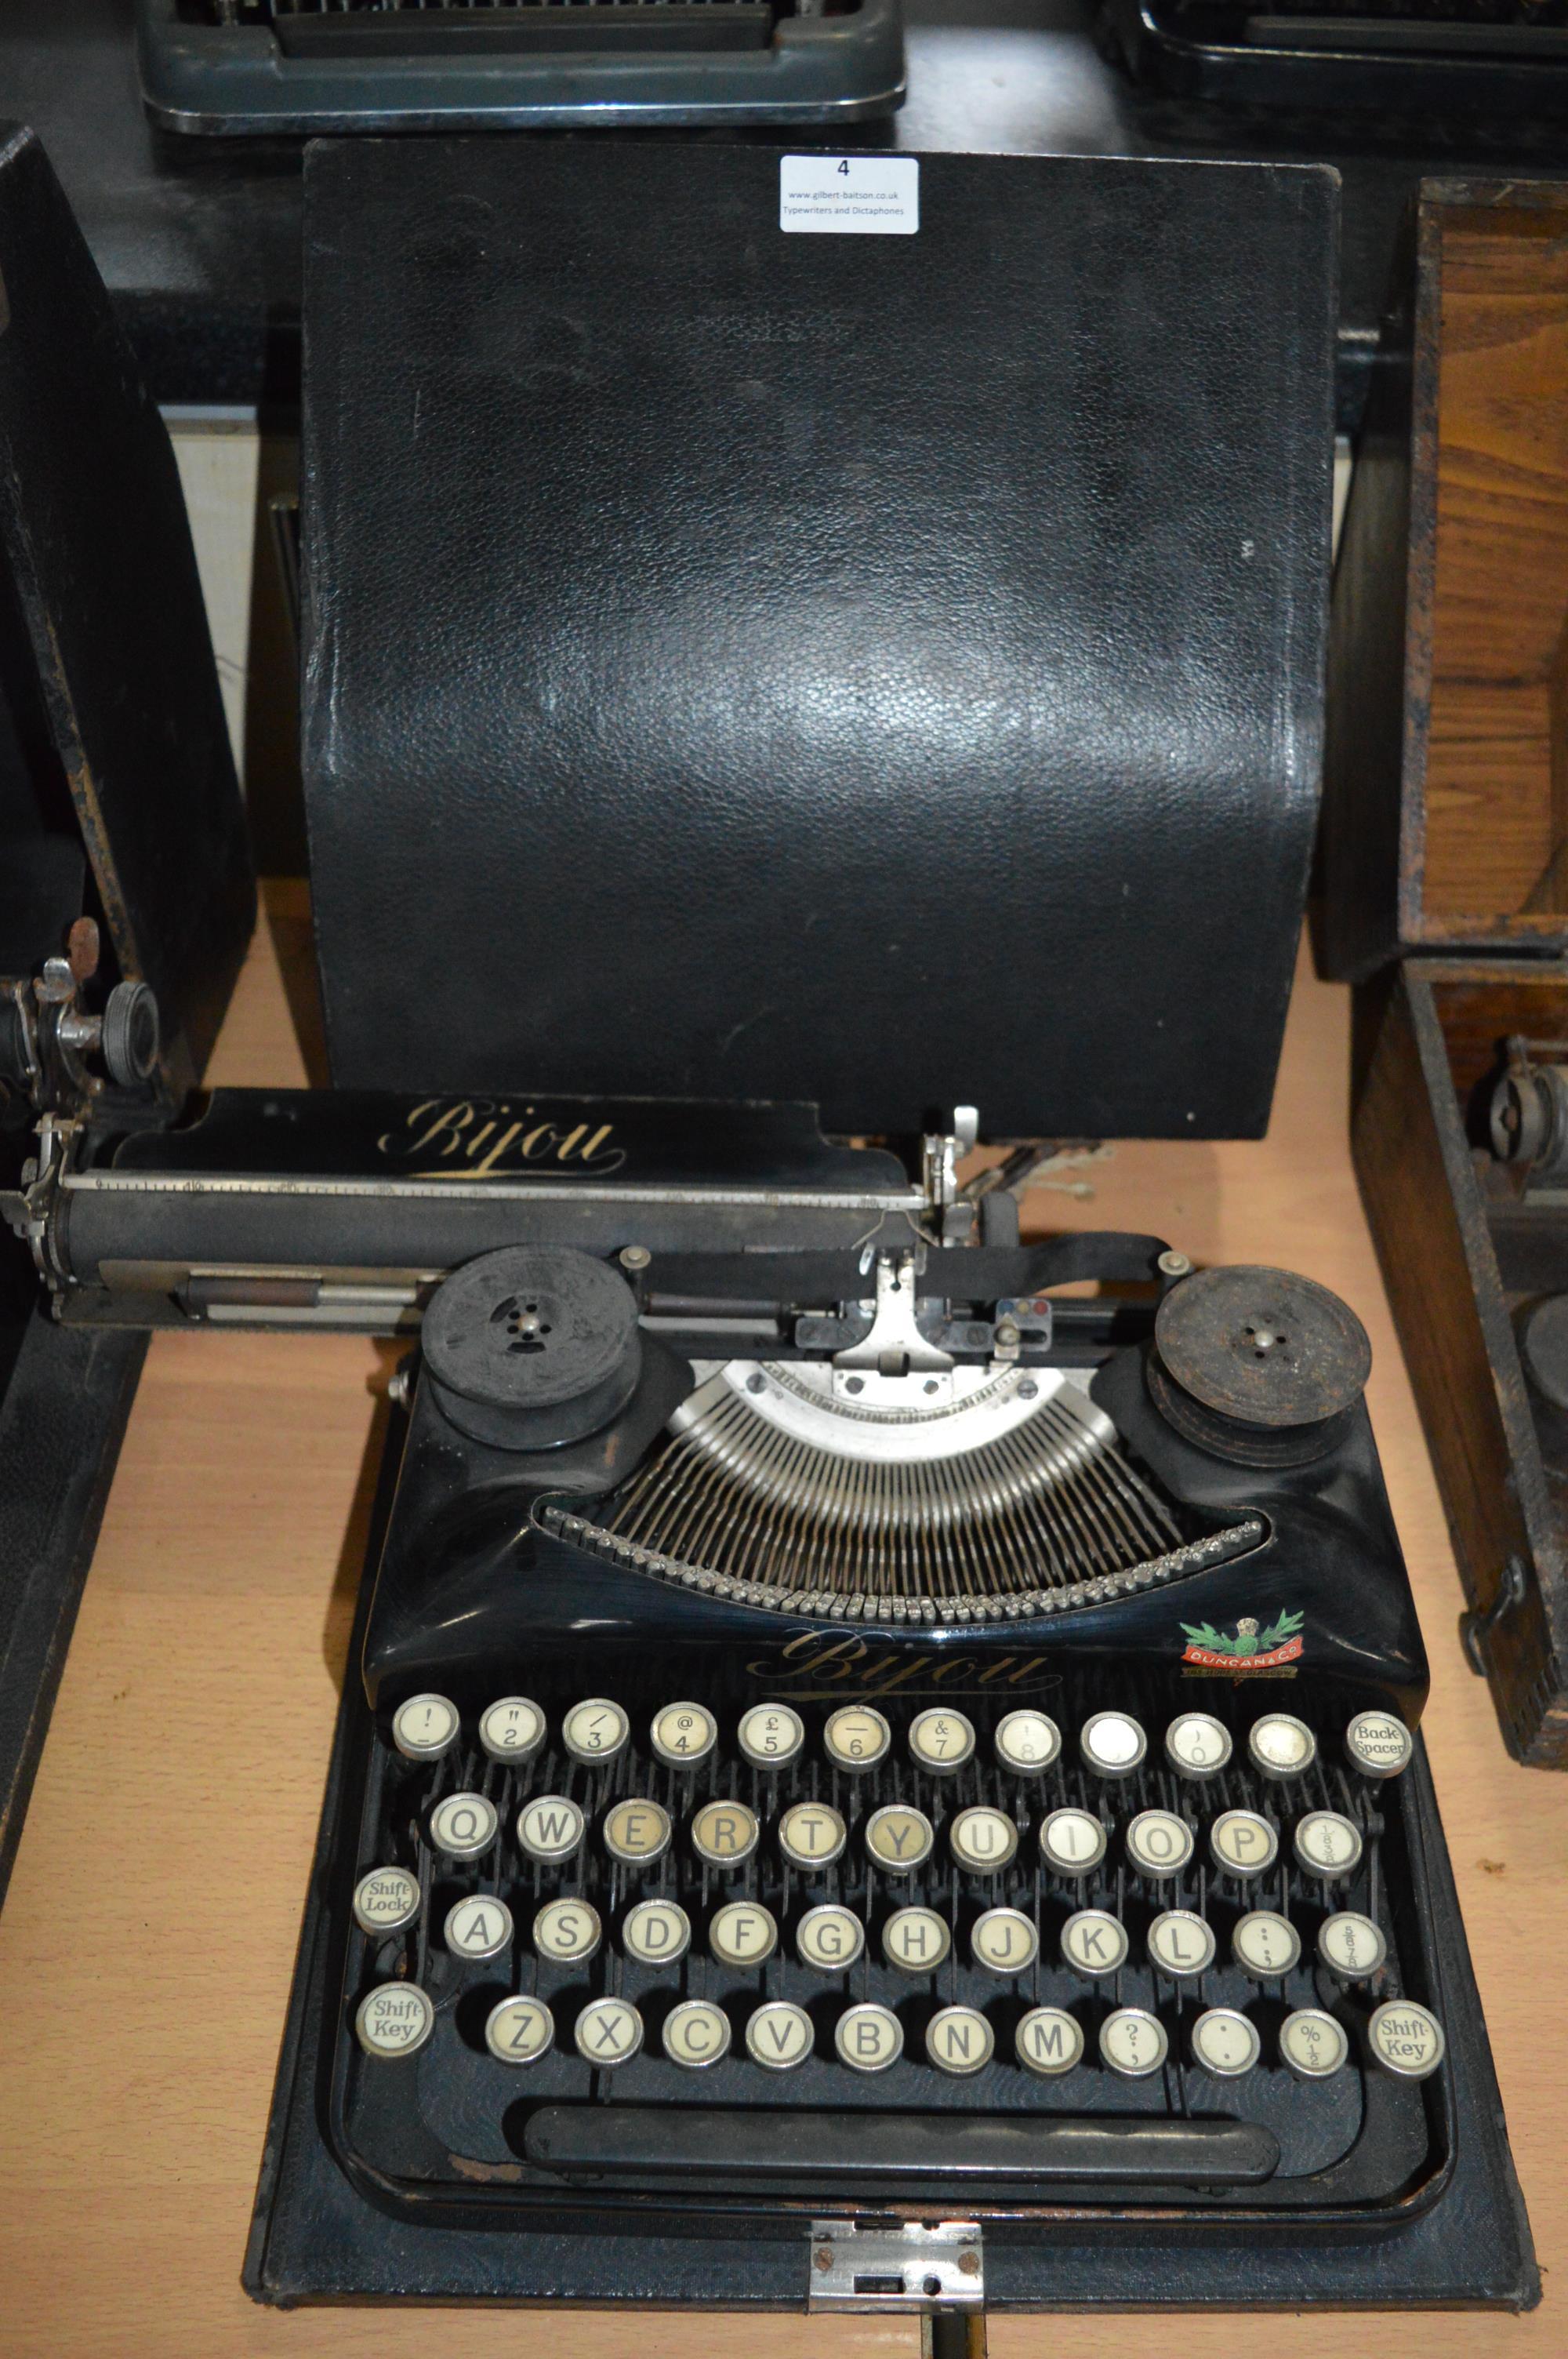 Bijou Typewriter by Duncan & Co, Glasgow in Original Black Carry Case